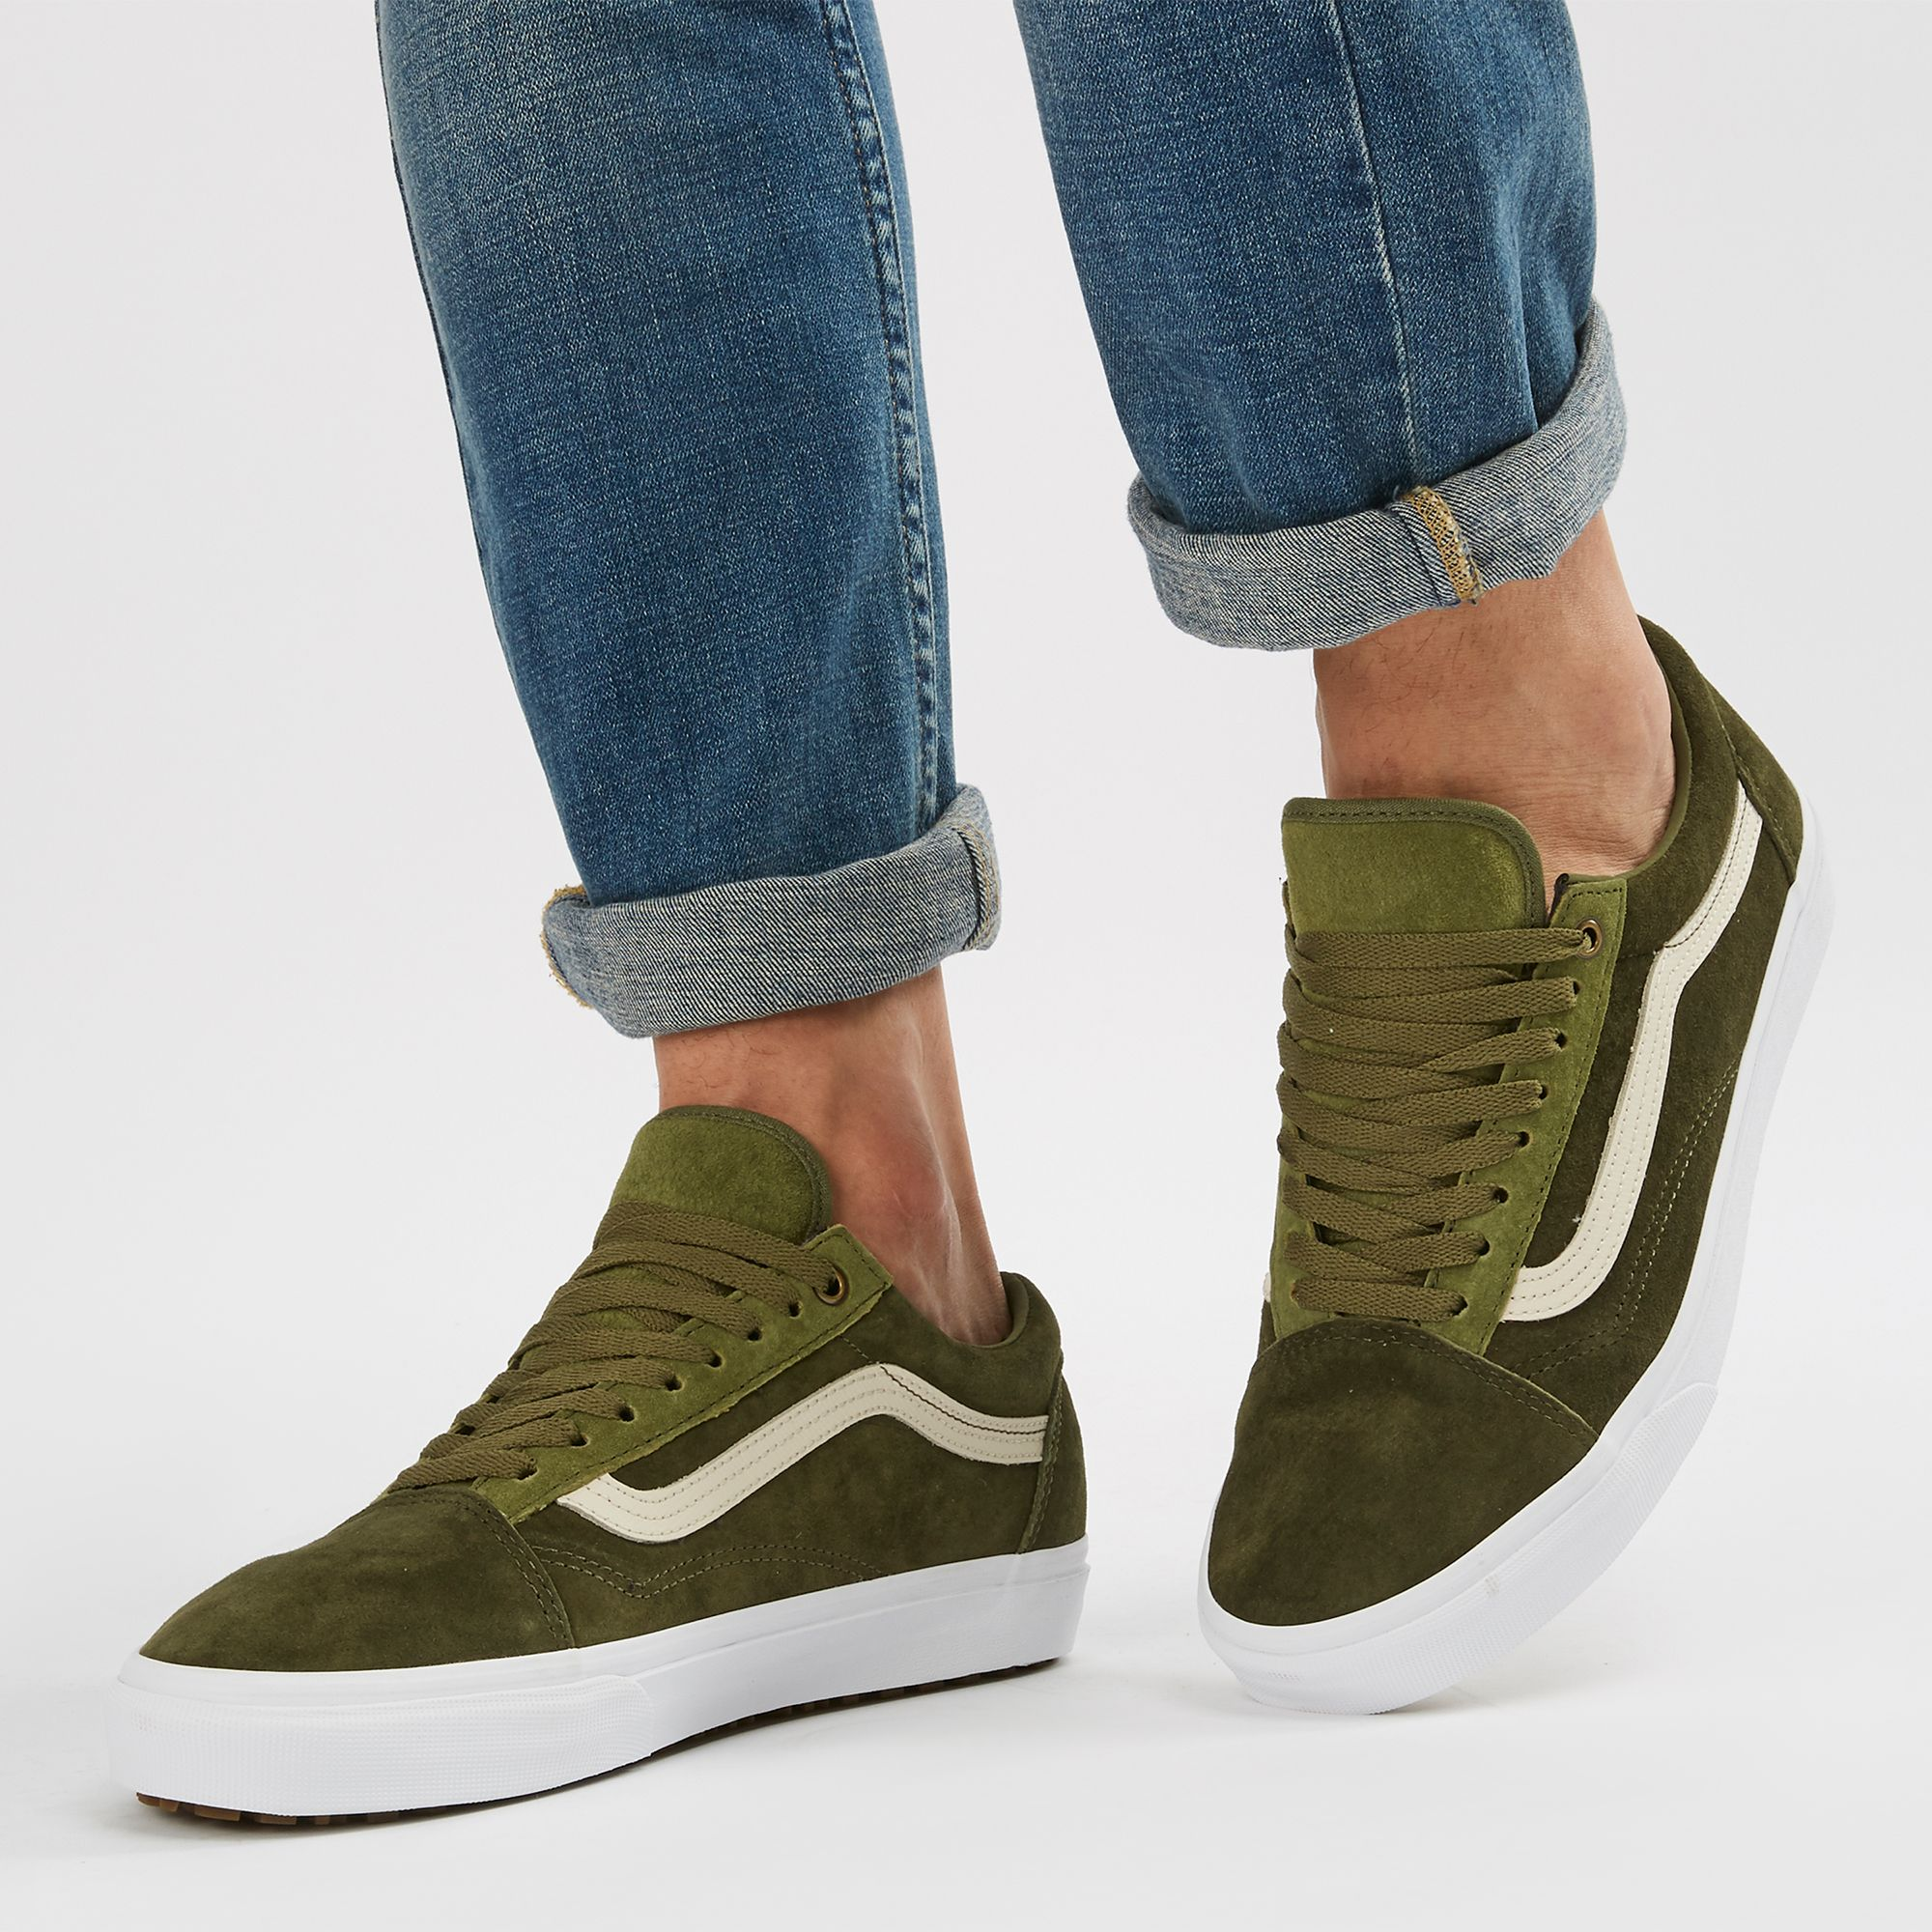 Vans Old Skool MTE Shoe | Sneakers | Shoes | Sports Fashion